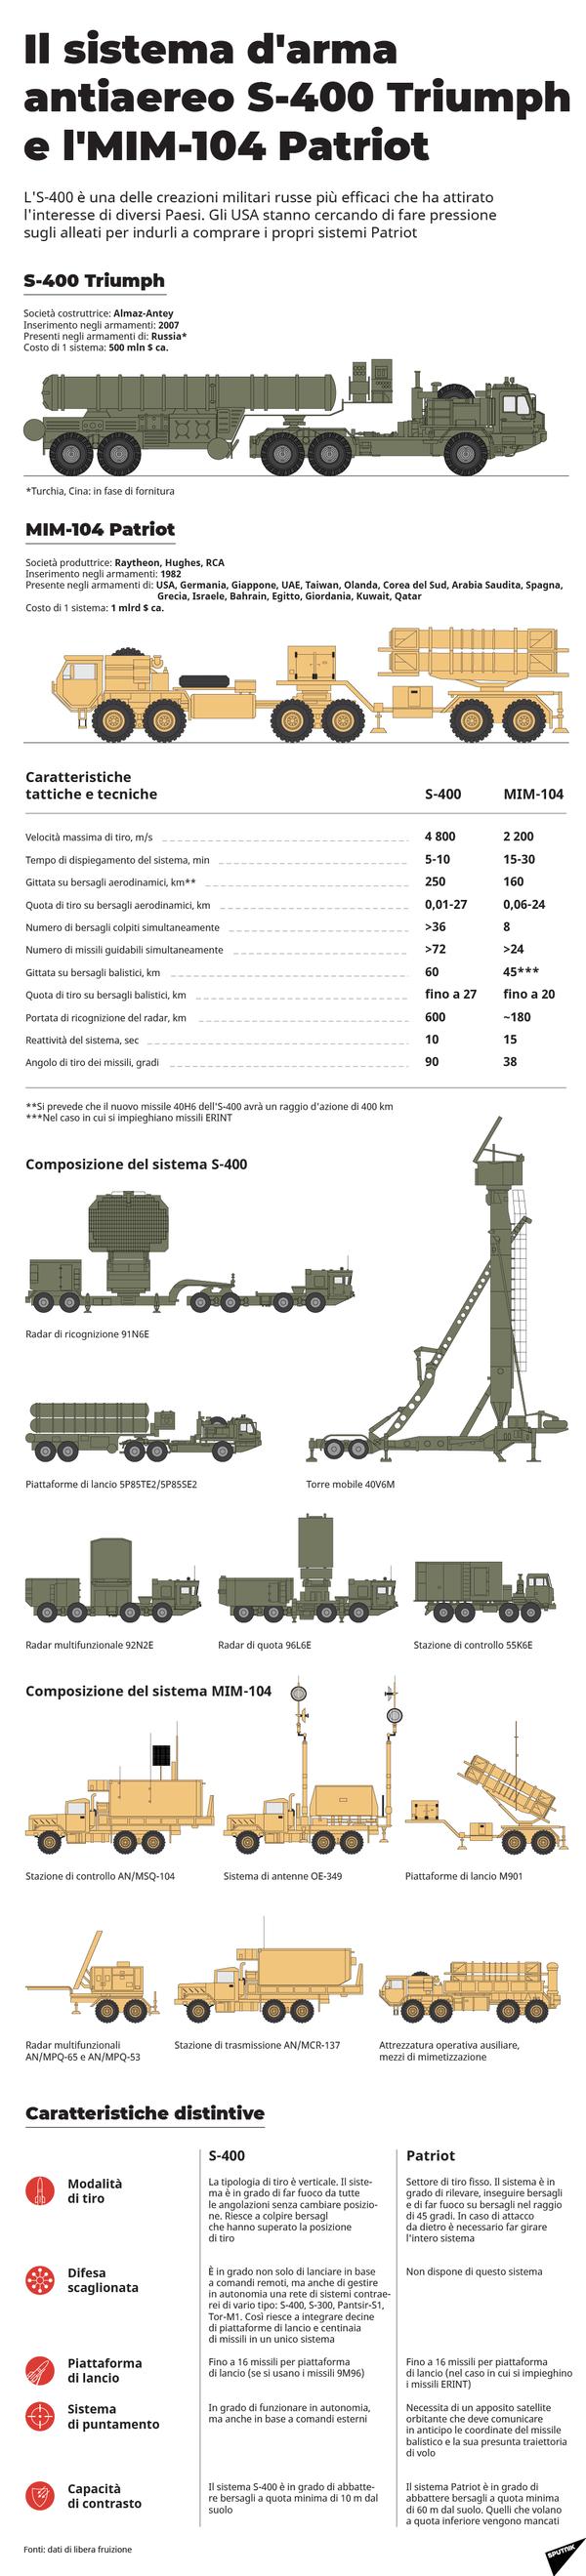 Il sistema d'arma antiaereo S-400 Triumph e l'MIM-104 Patriot - Sputnik Italia